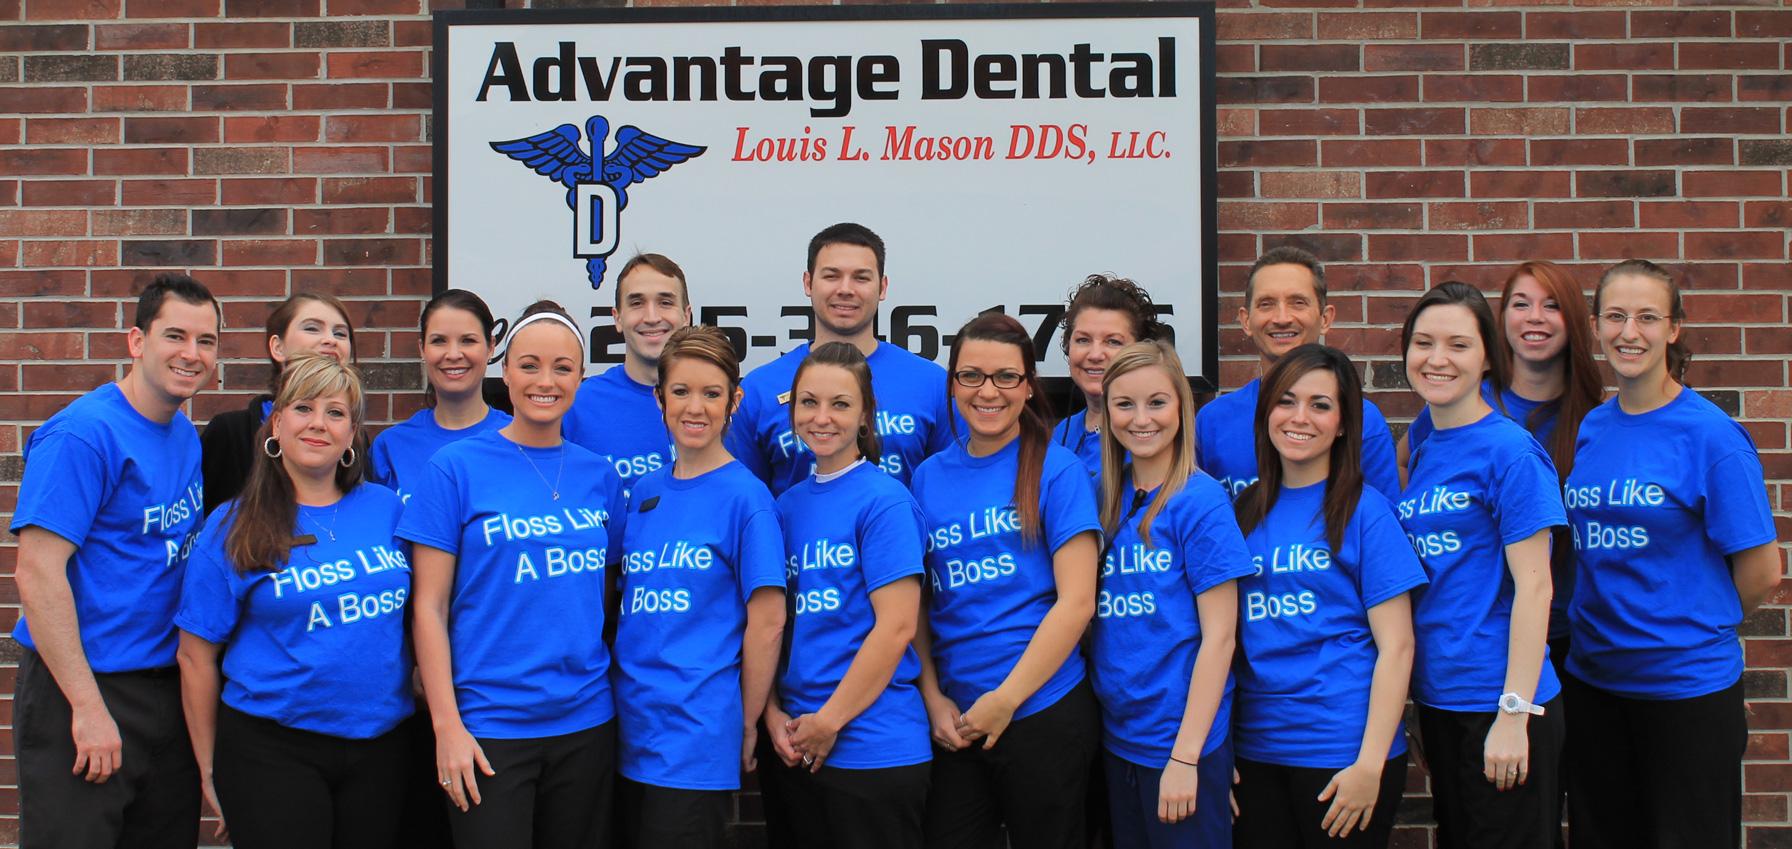 Dental Office T-Shirt Design Ideas - Custom Dental Office Shirts ...